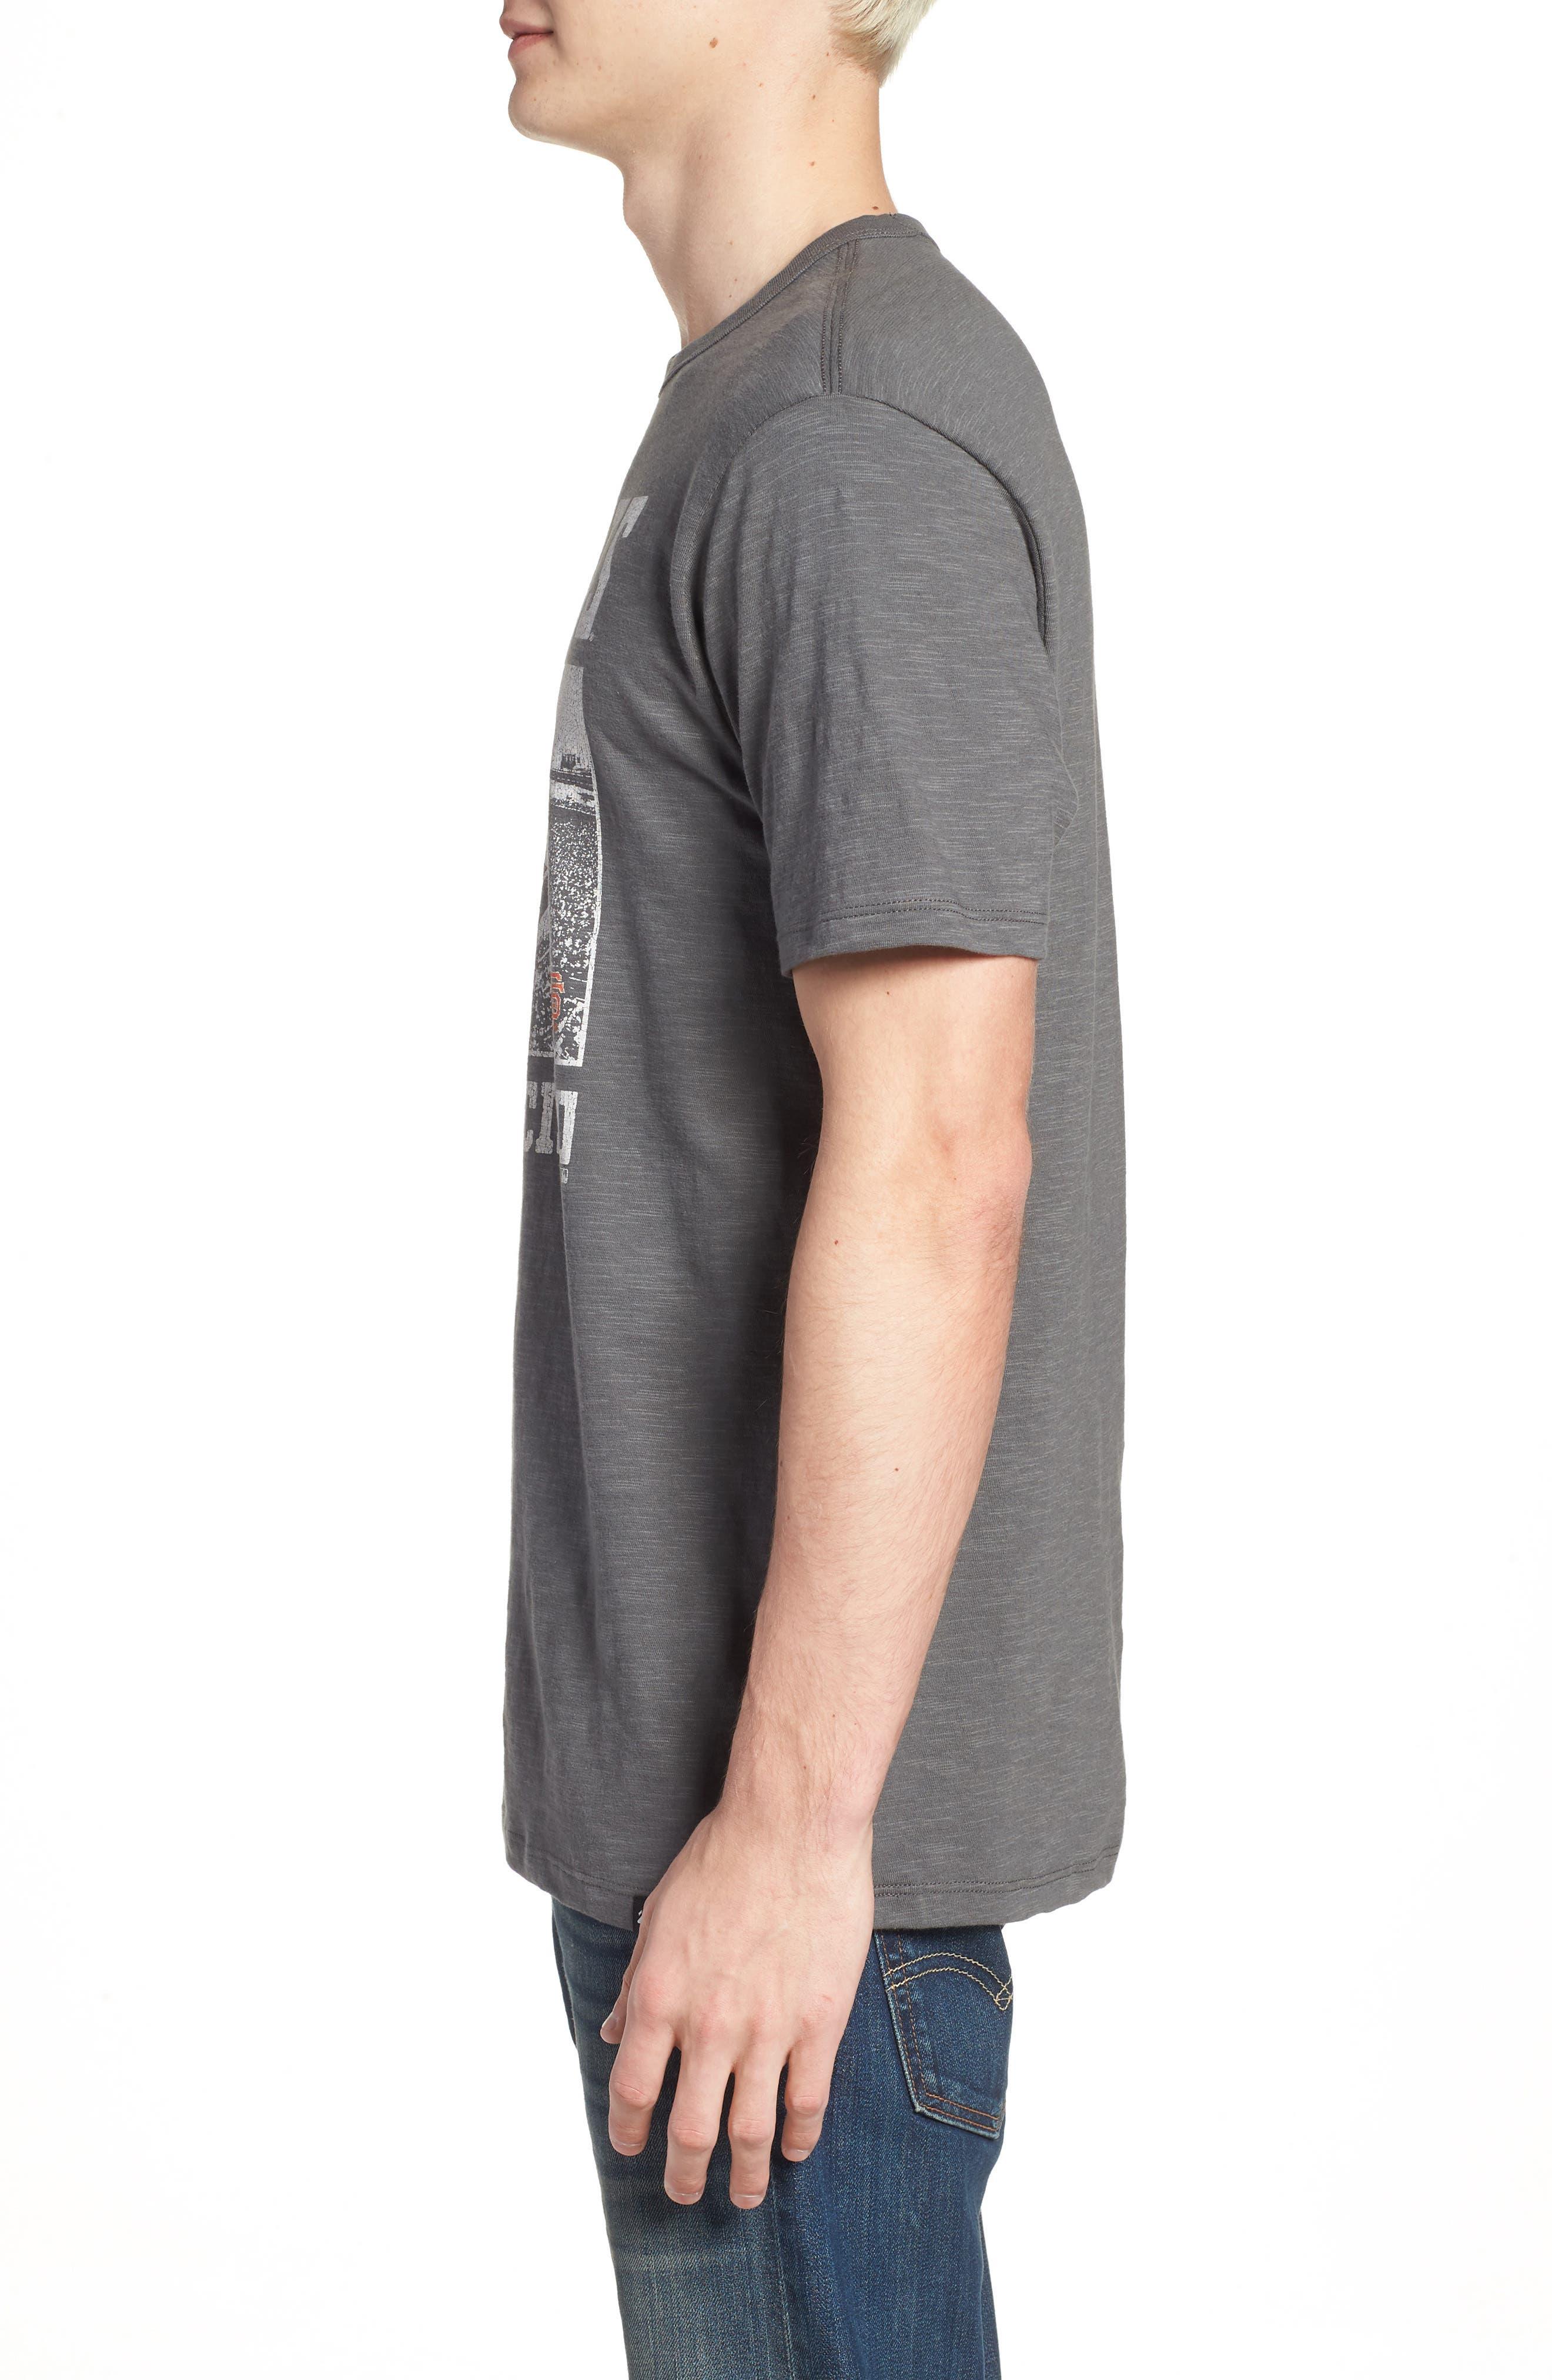 MLB Overdrive Scrum San Francisco Giants T-Shirt,                             Alternate thumbnail 3, color,                             Submarine